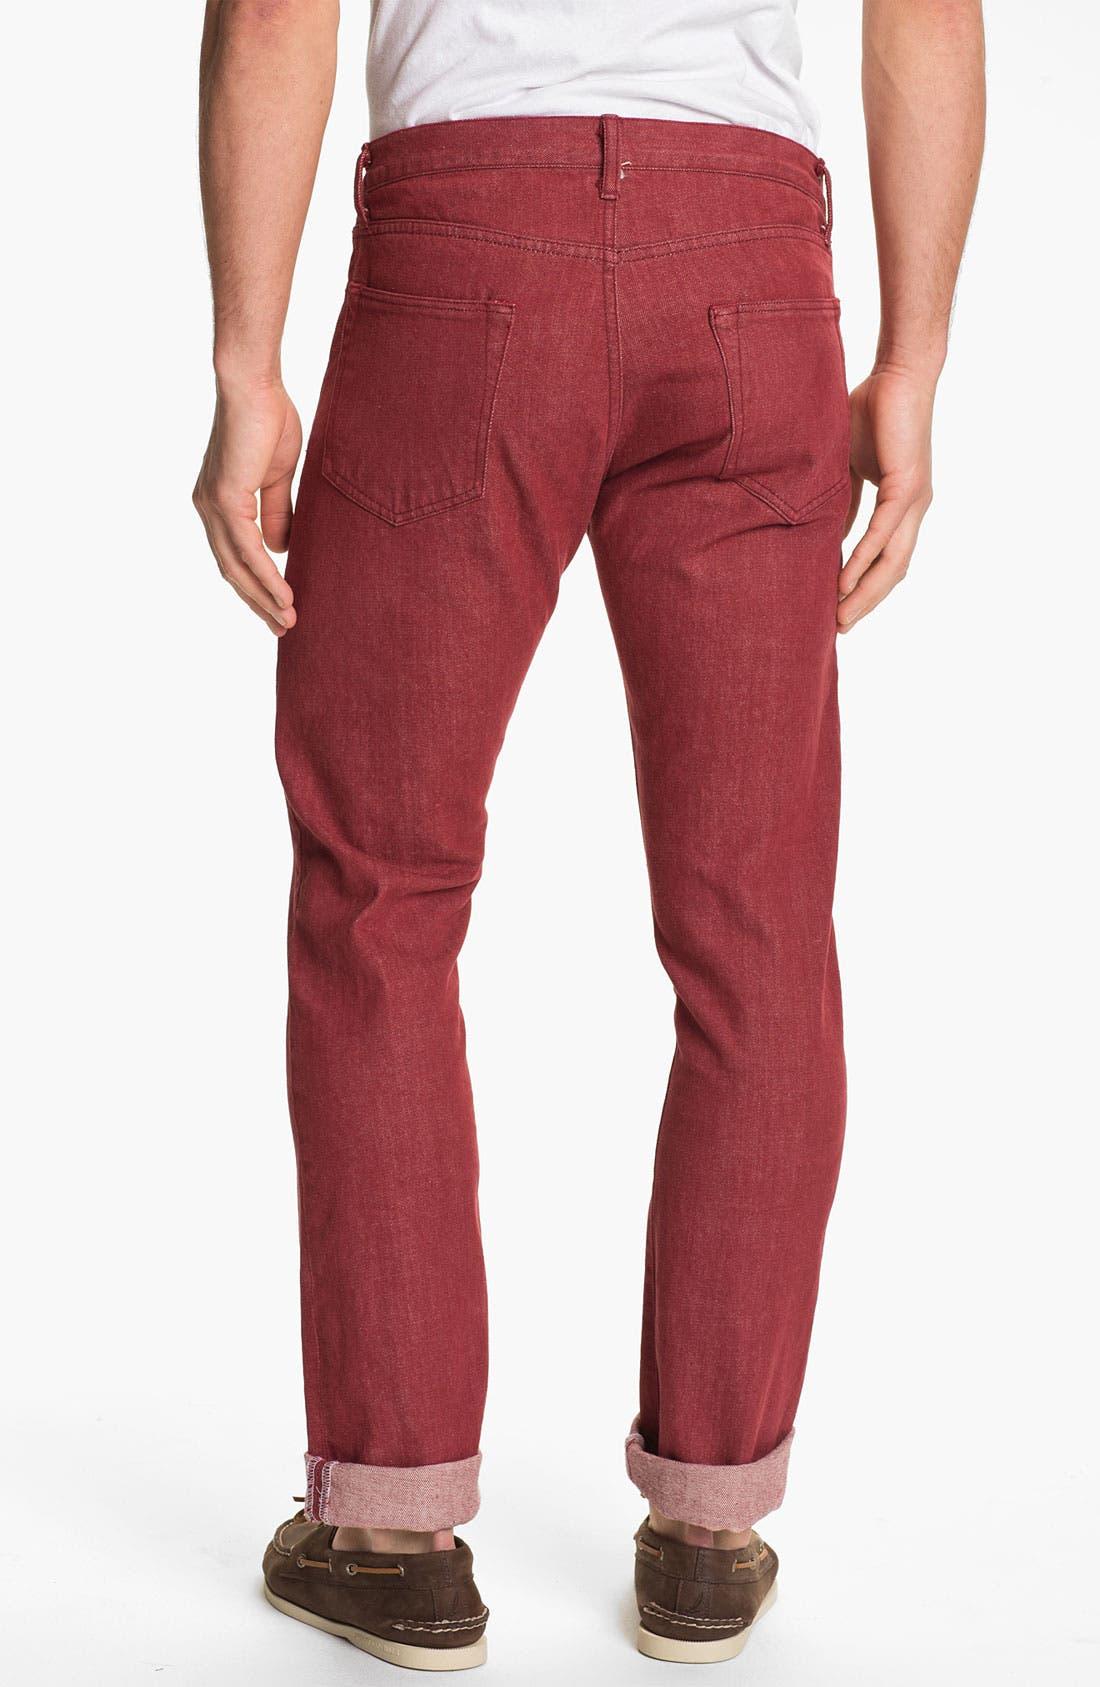 Main Image - J. Press York Street 'Hanover' Slim Fit Selvedge Jeans